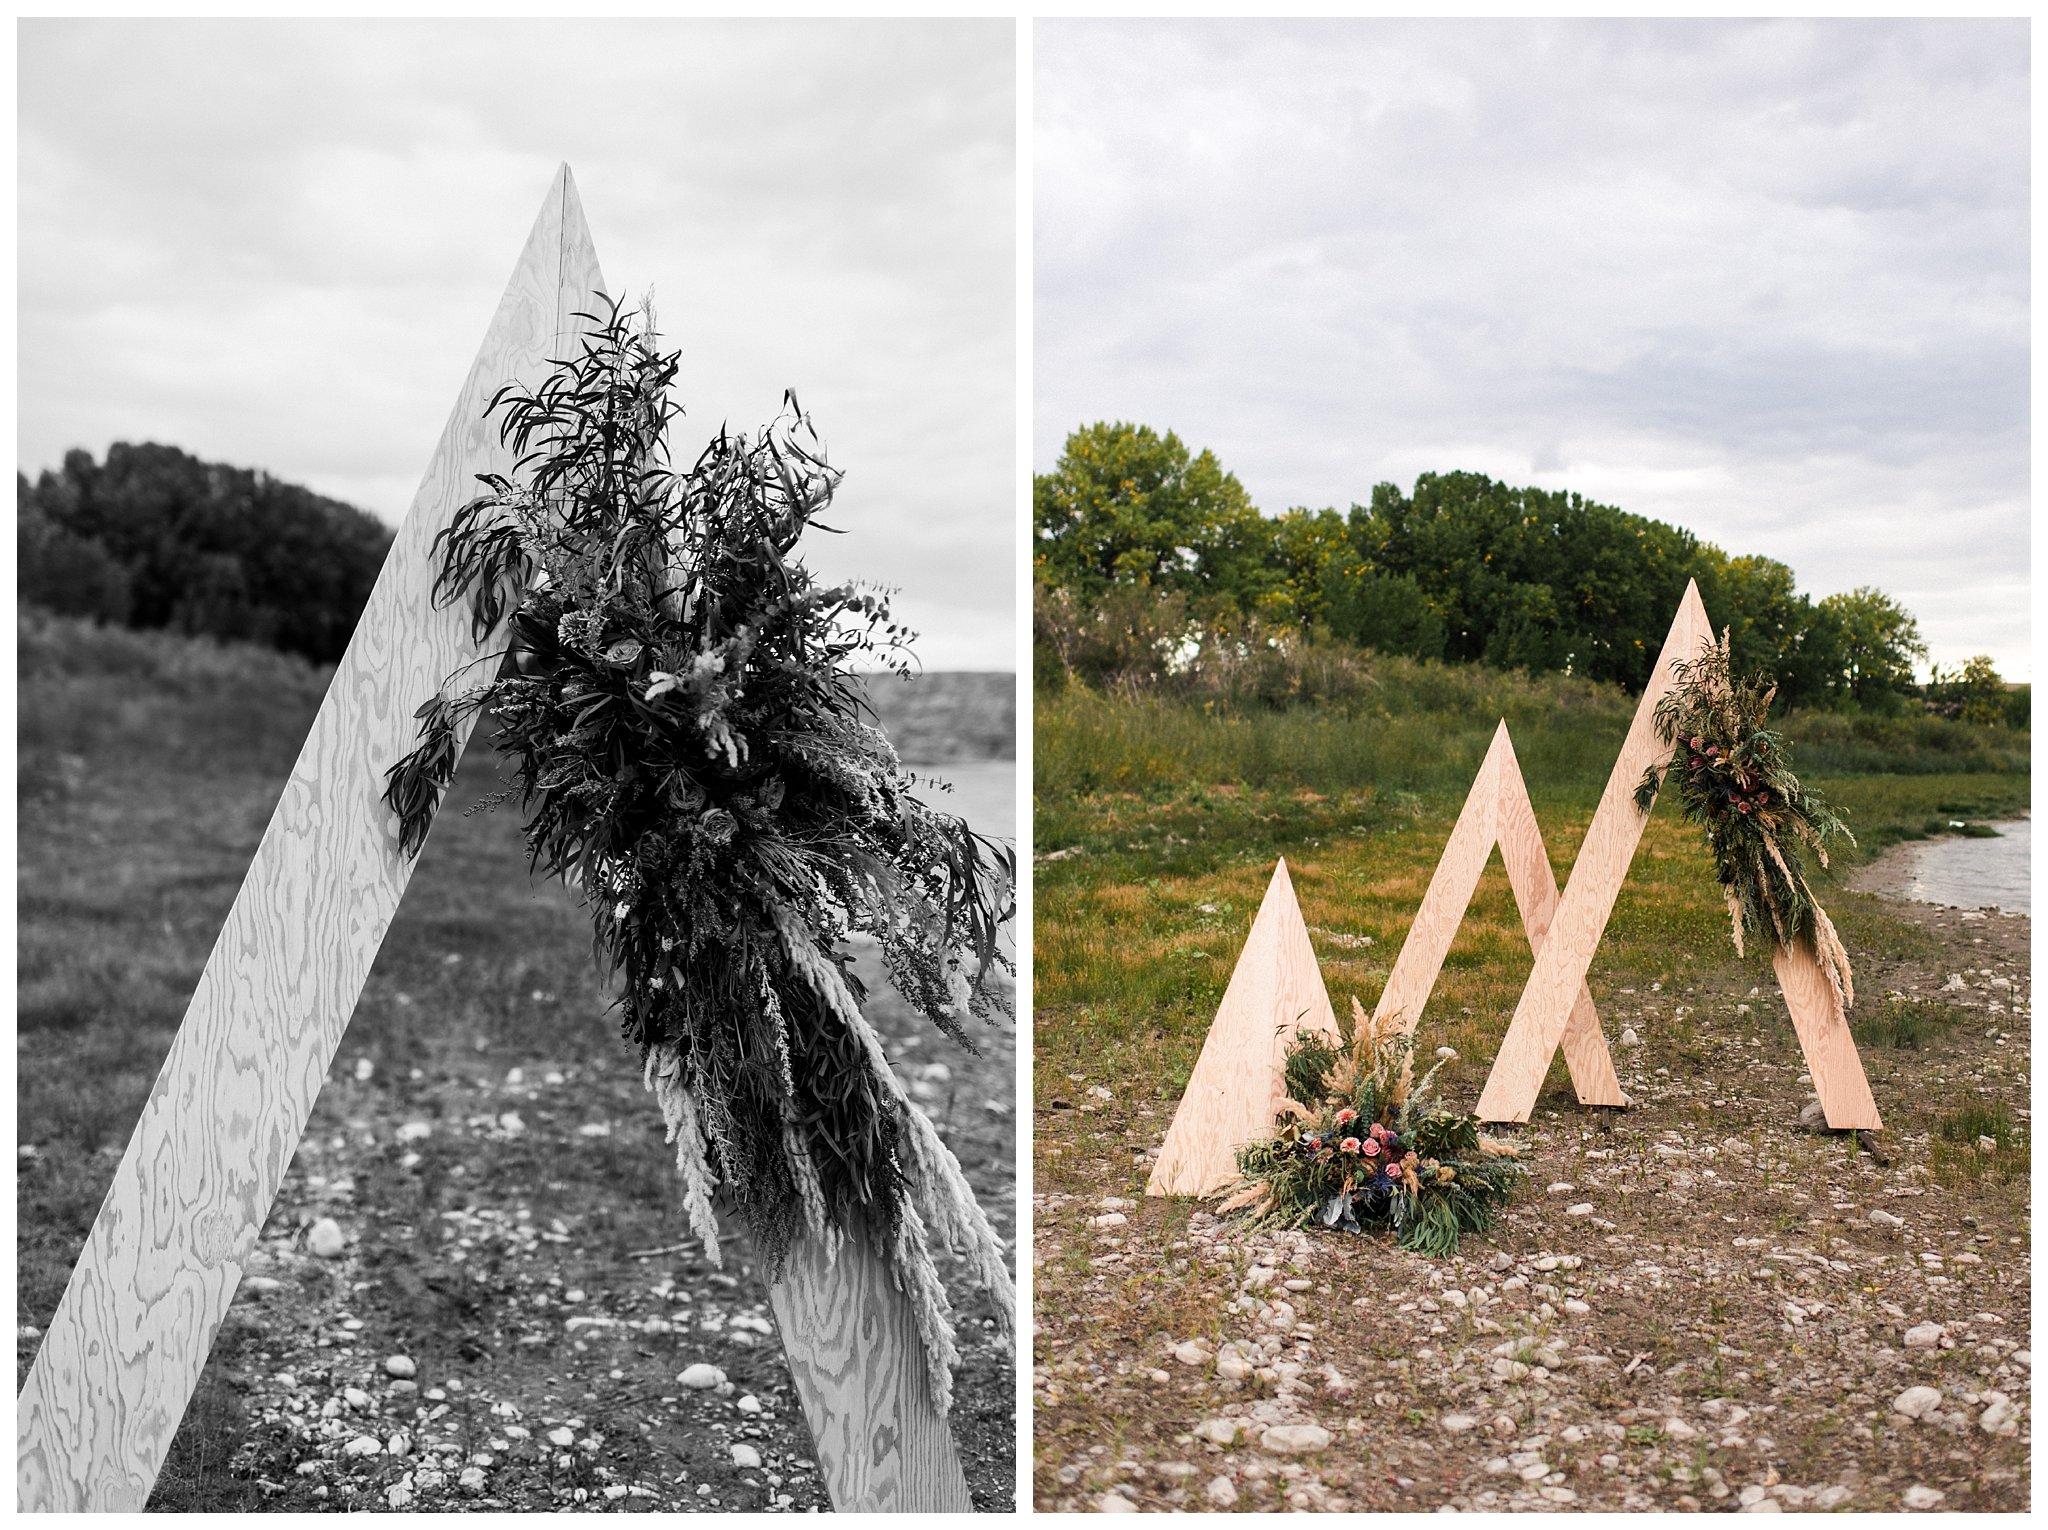 Custom built triangle ceremony setup + Florals by Natalie Noel.